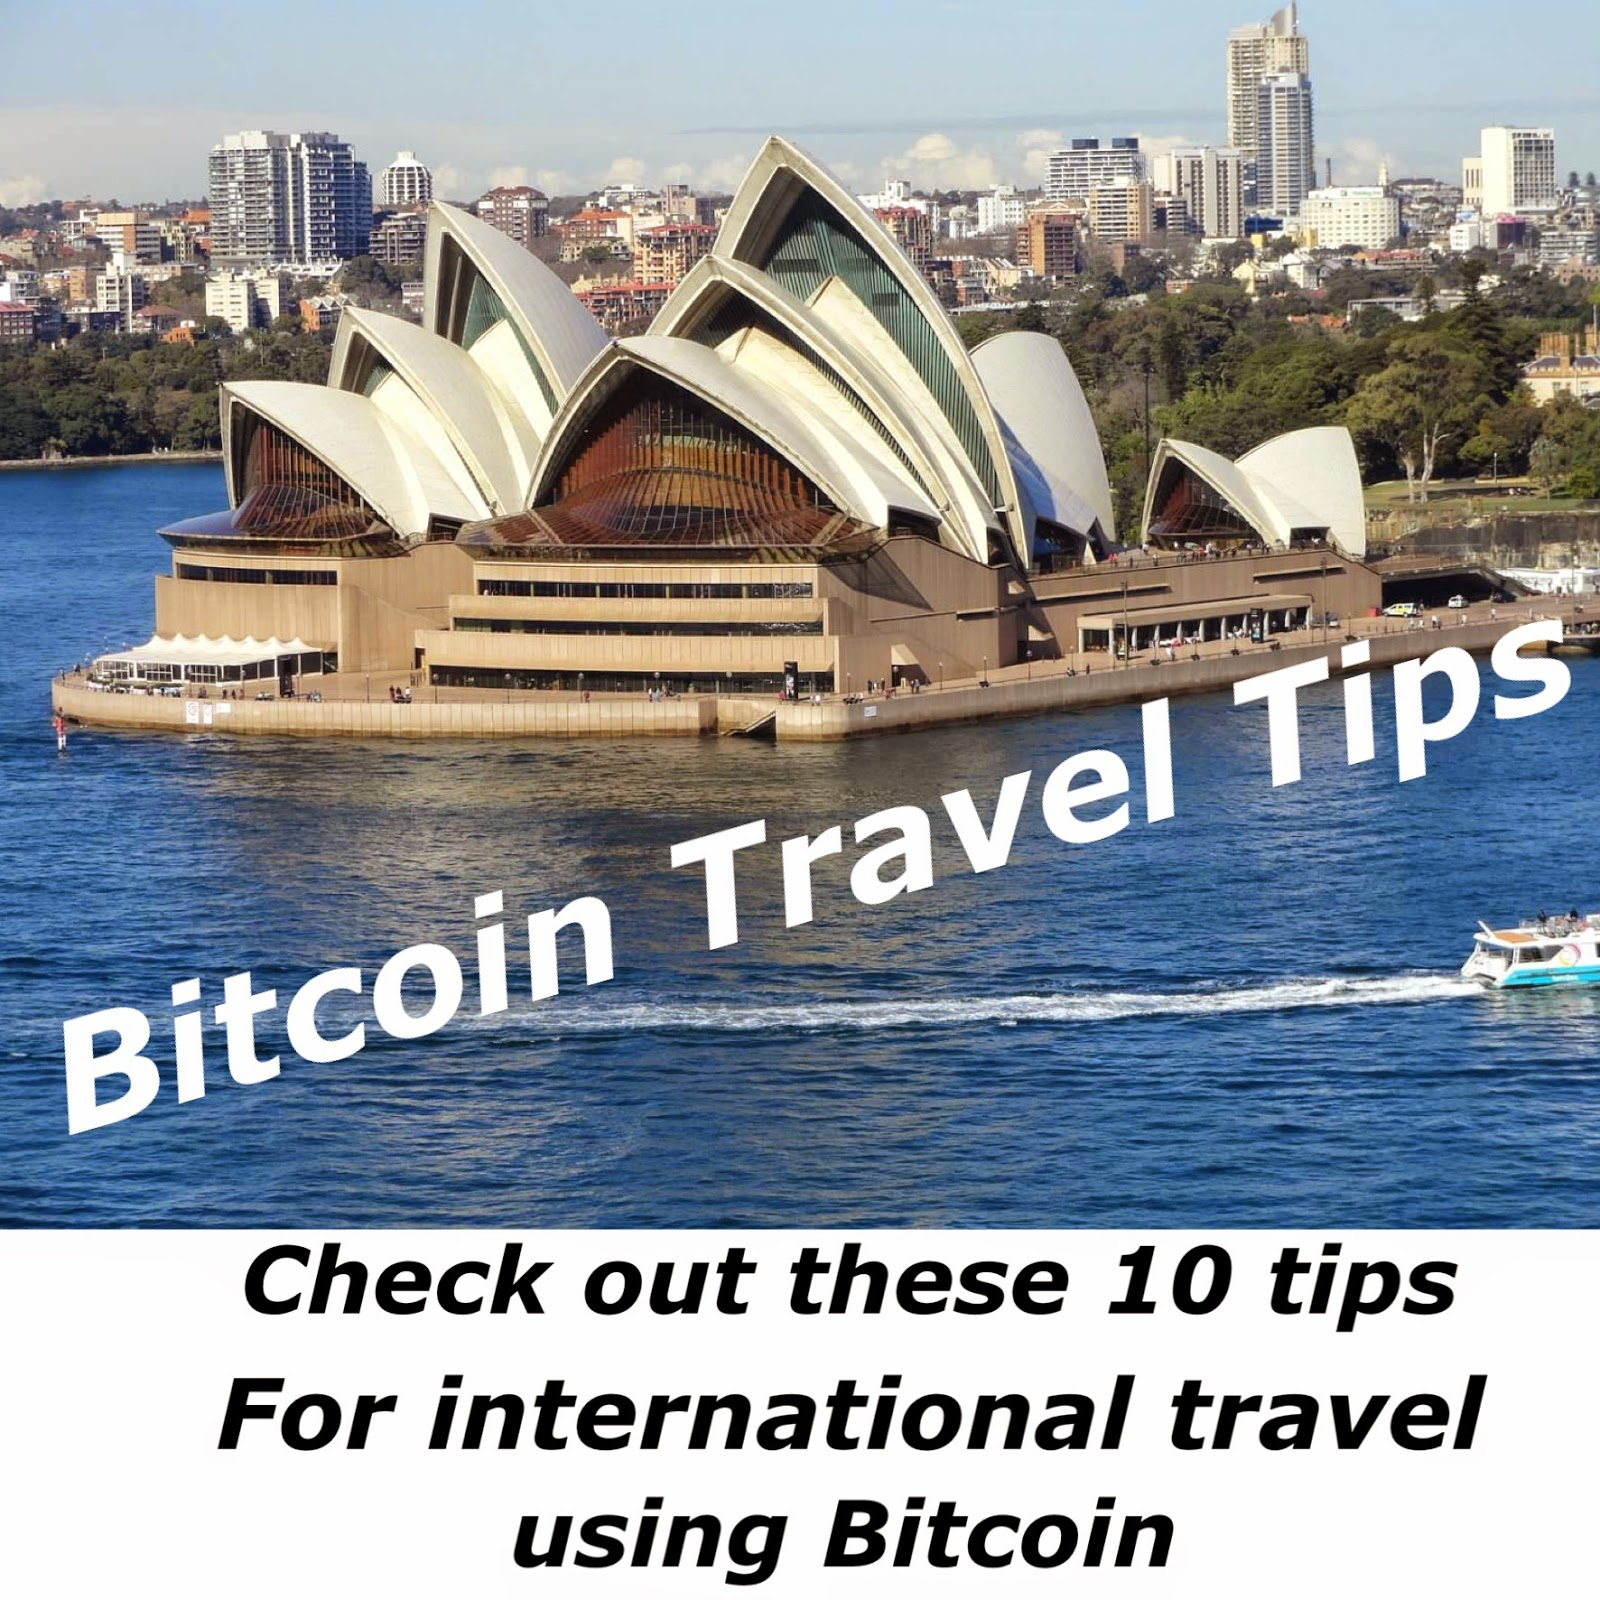 International-Travel-Bitcoin-Tips